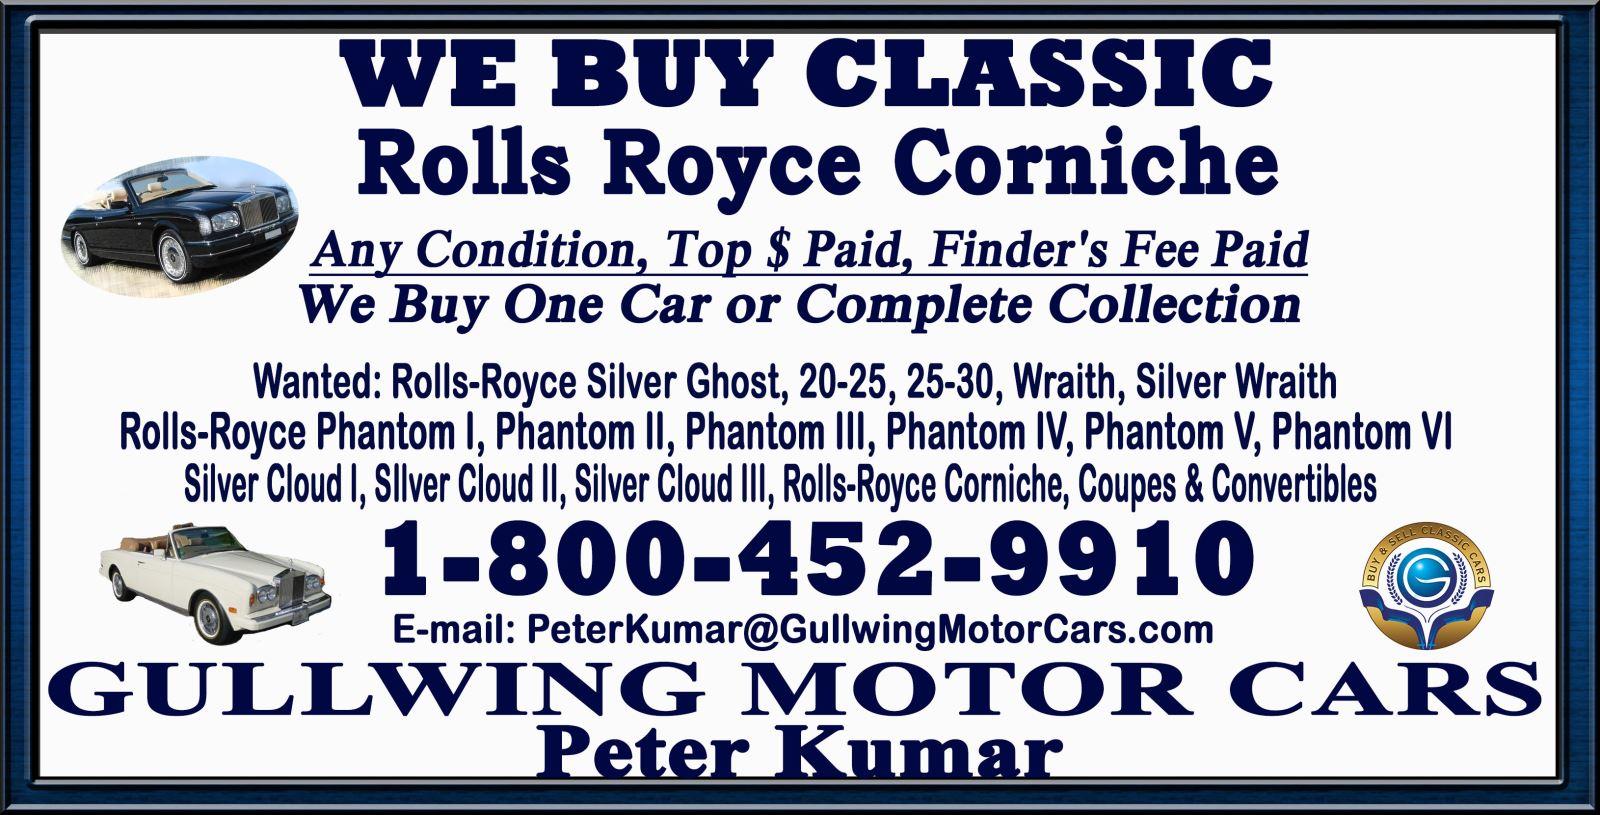 Sell Classic Rolls Royce Corniche | Call Gullwing Motor if Vintage Rolls Royce Corniche For Sale